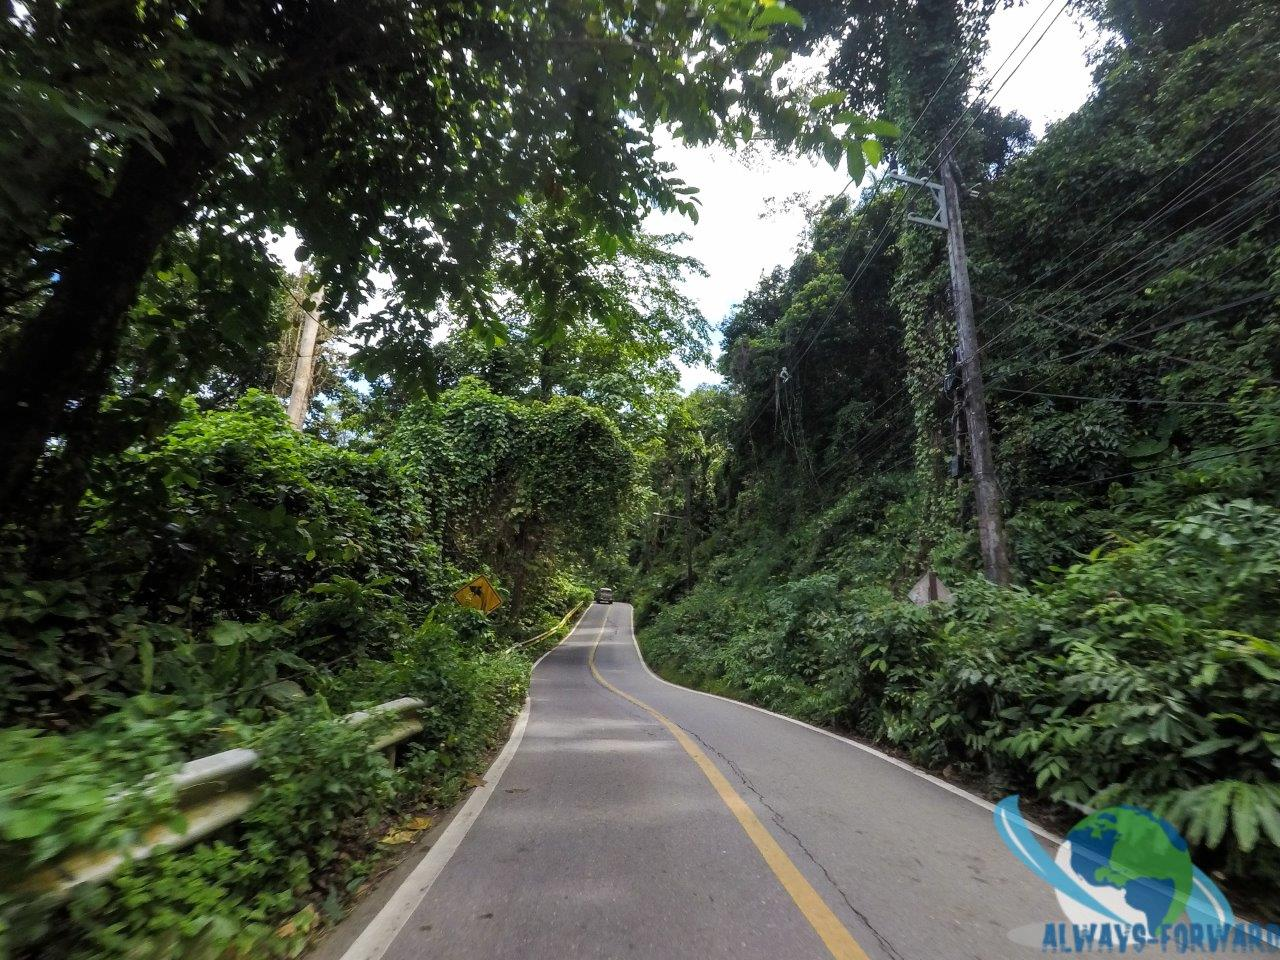 Strasse auf Koh Chang